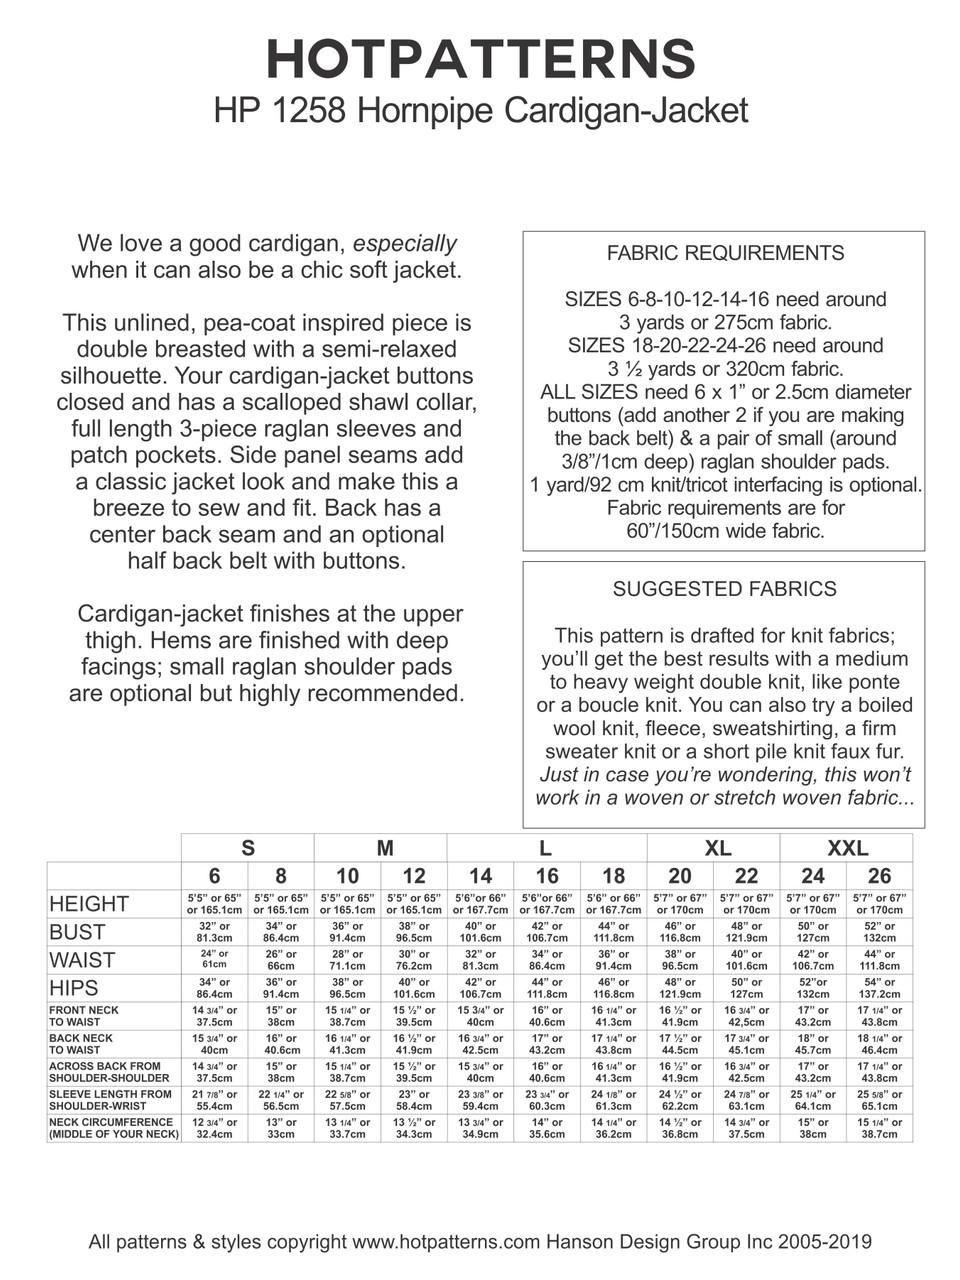 HP 1258 Hornpipe Cardigan-Jacket